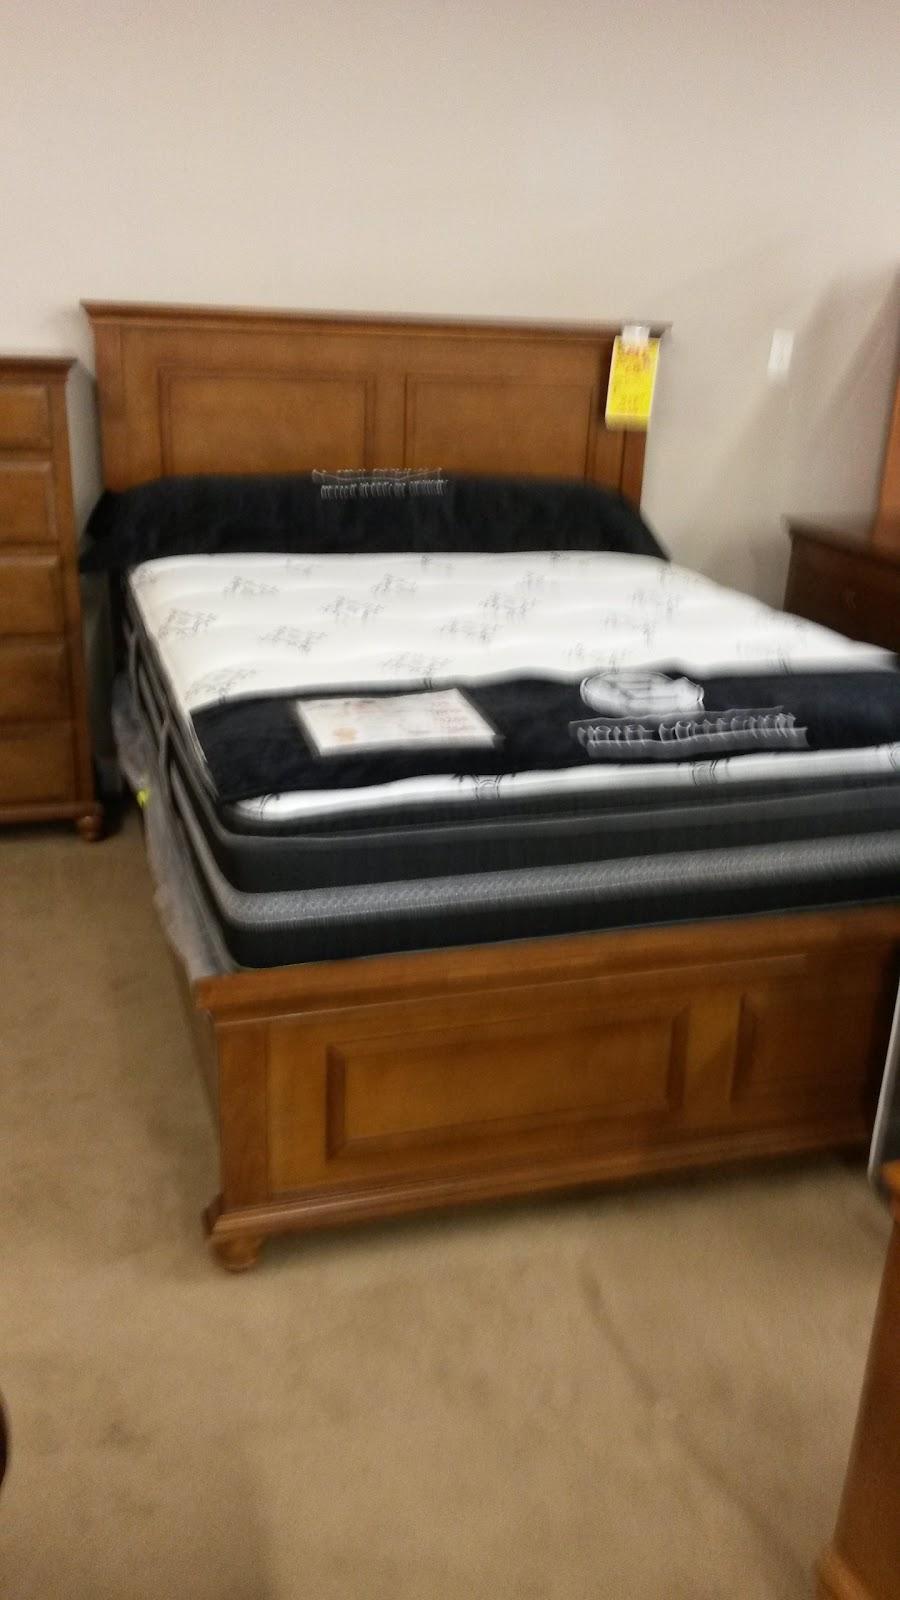 Lucas Furniture & Mattress Warehouse & Clearance Center - furniture store  | Photo 5 of 8 | Address: 1500 N Reed Rd, Kokomo, IN 46901, USA | Phone: (765) 553-5467